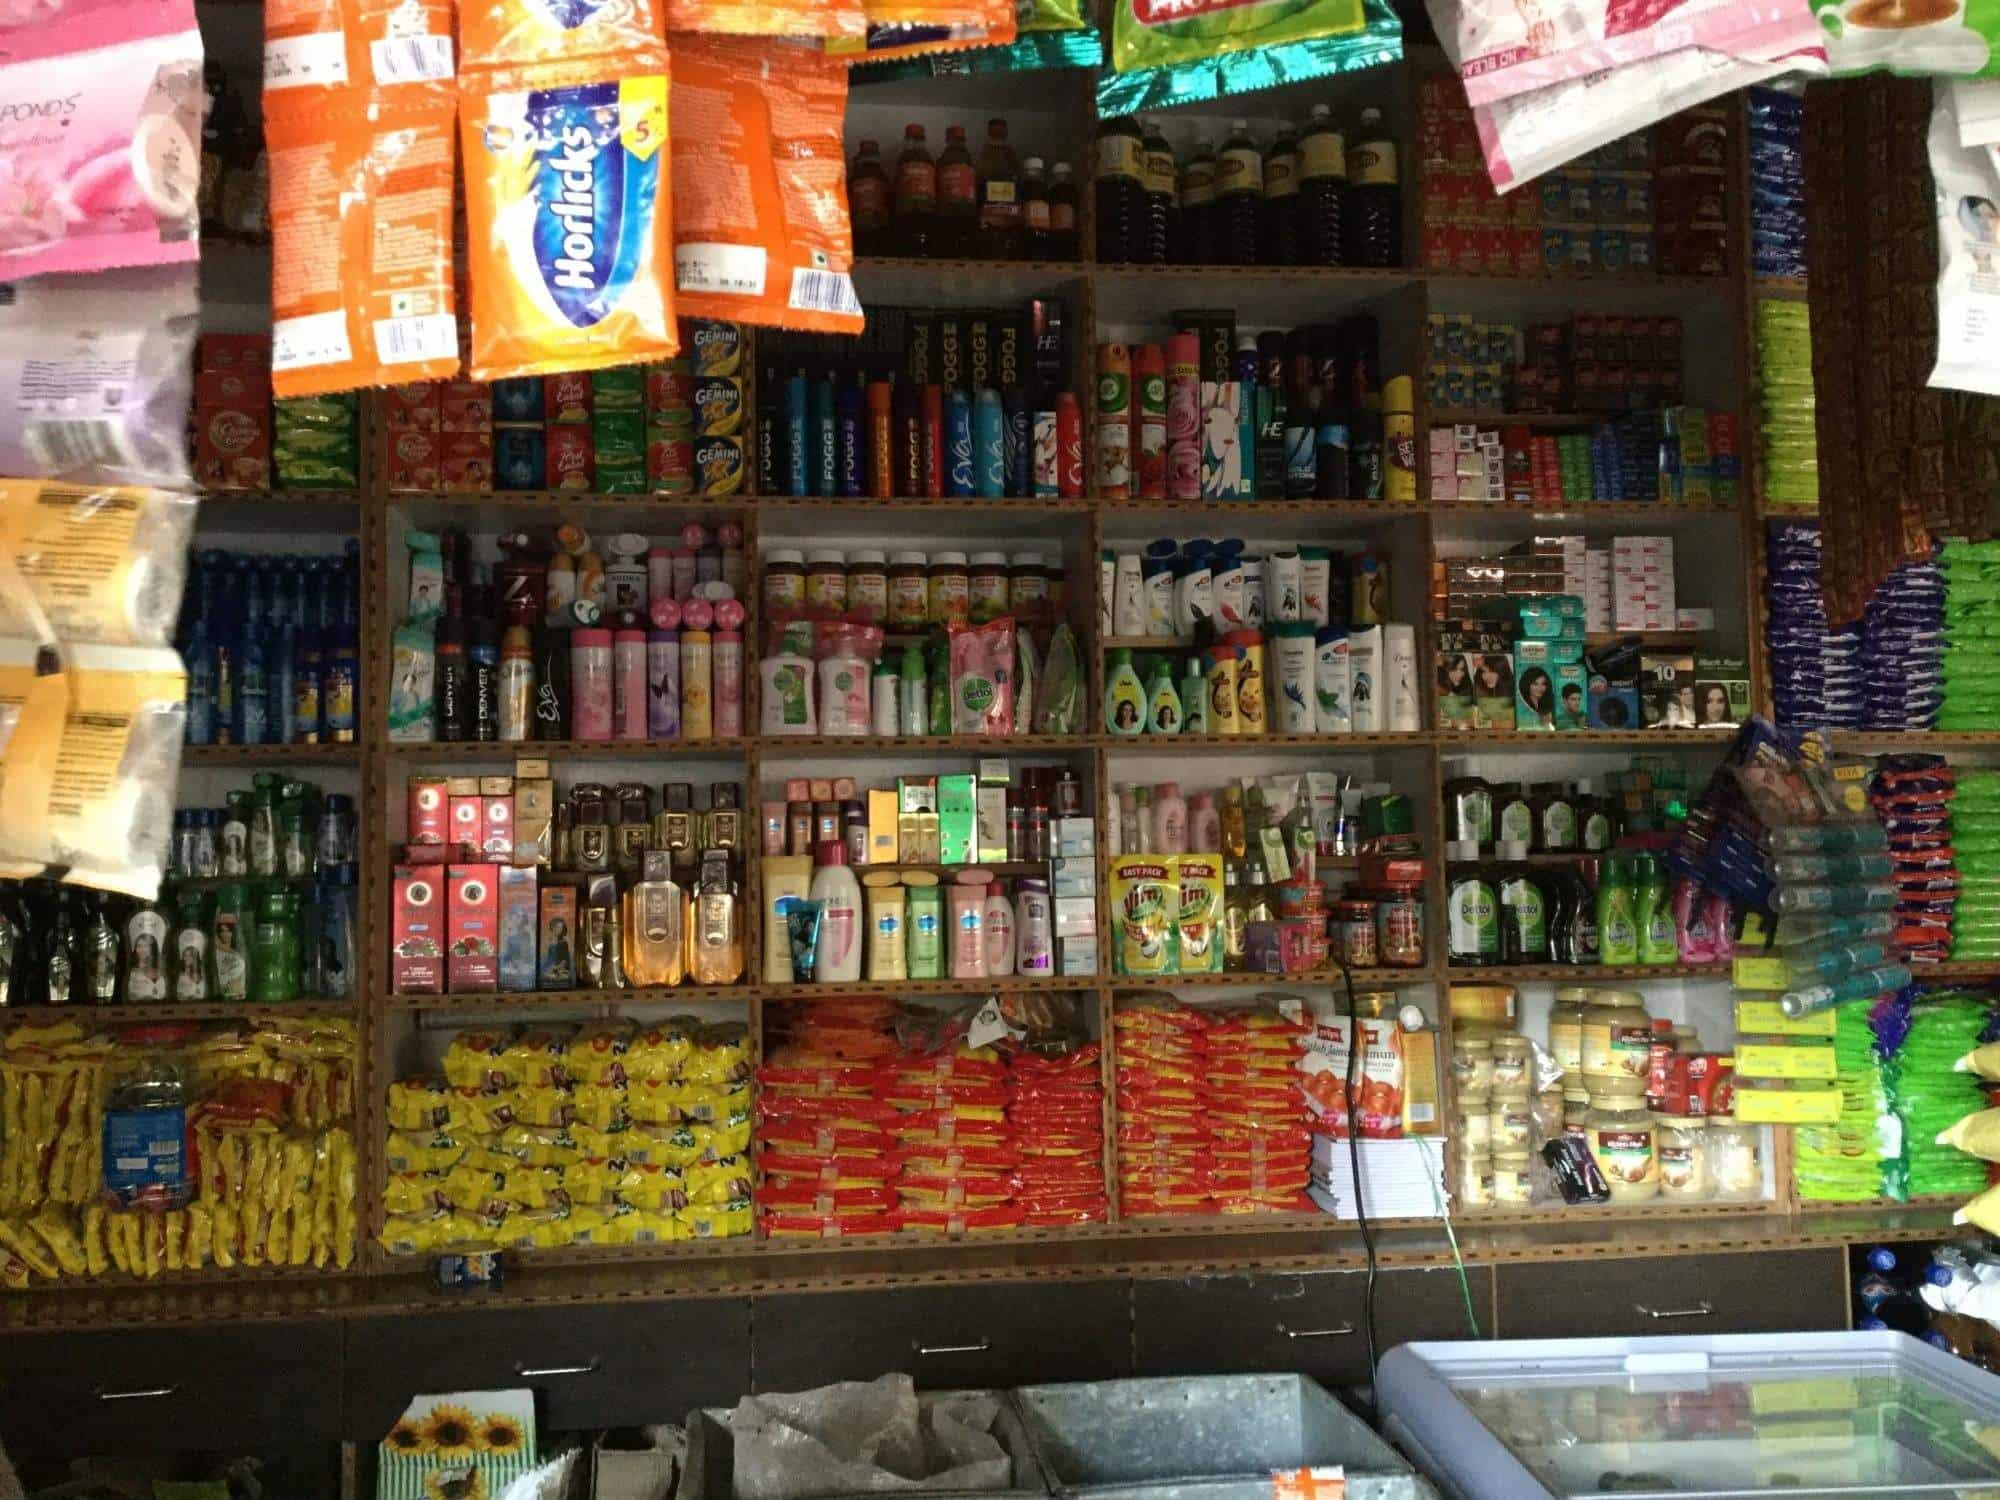 Sri Mathaji Kirana And General Store, Gachibowli - General Stores in